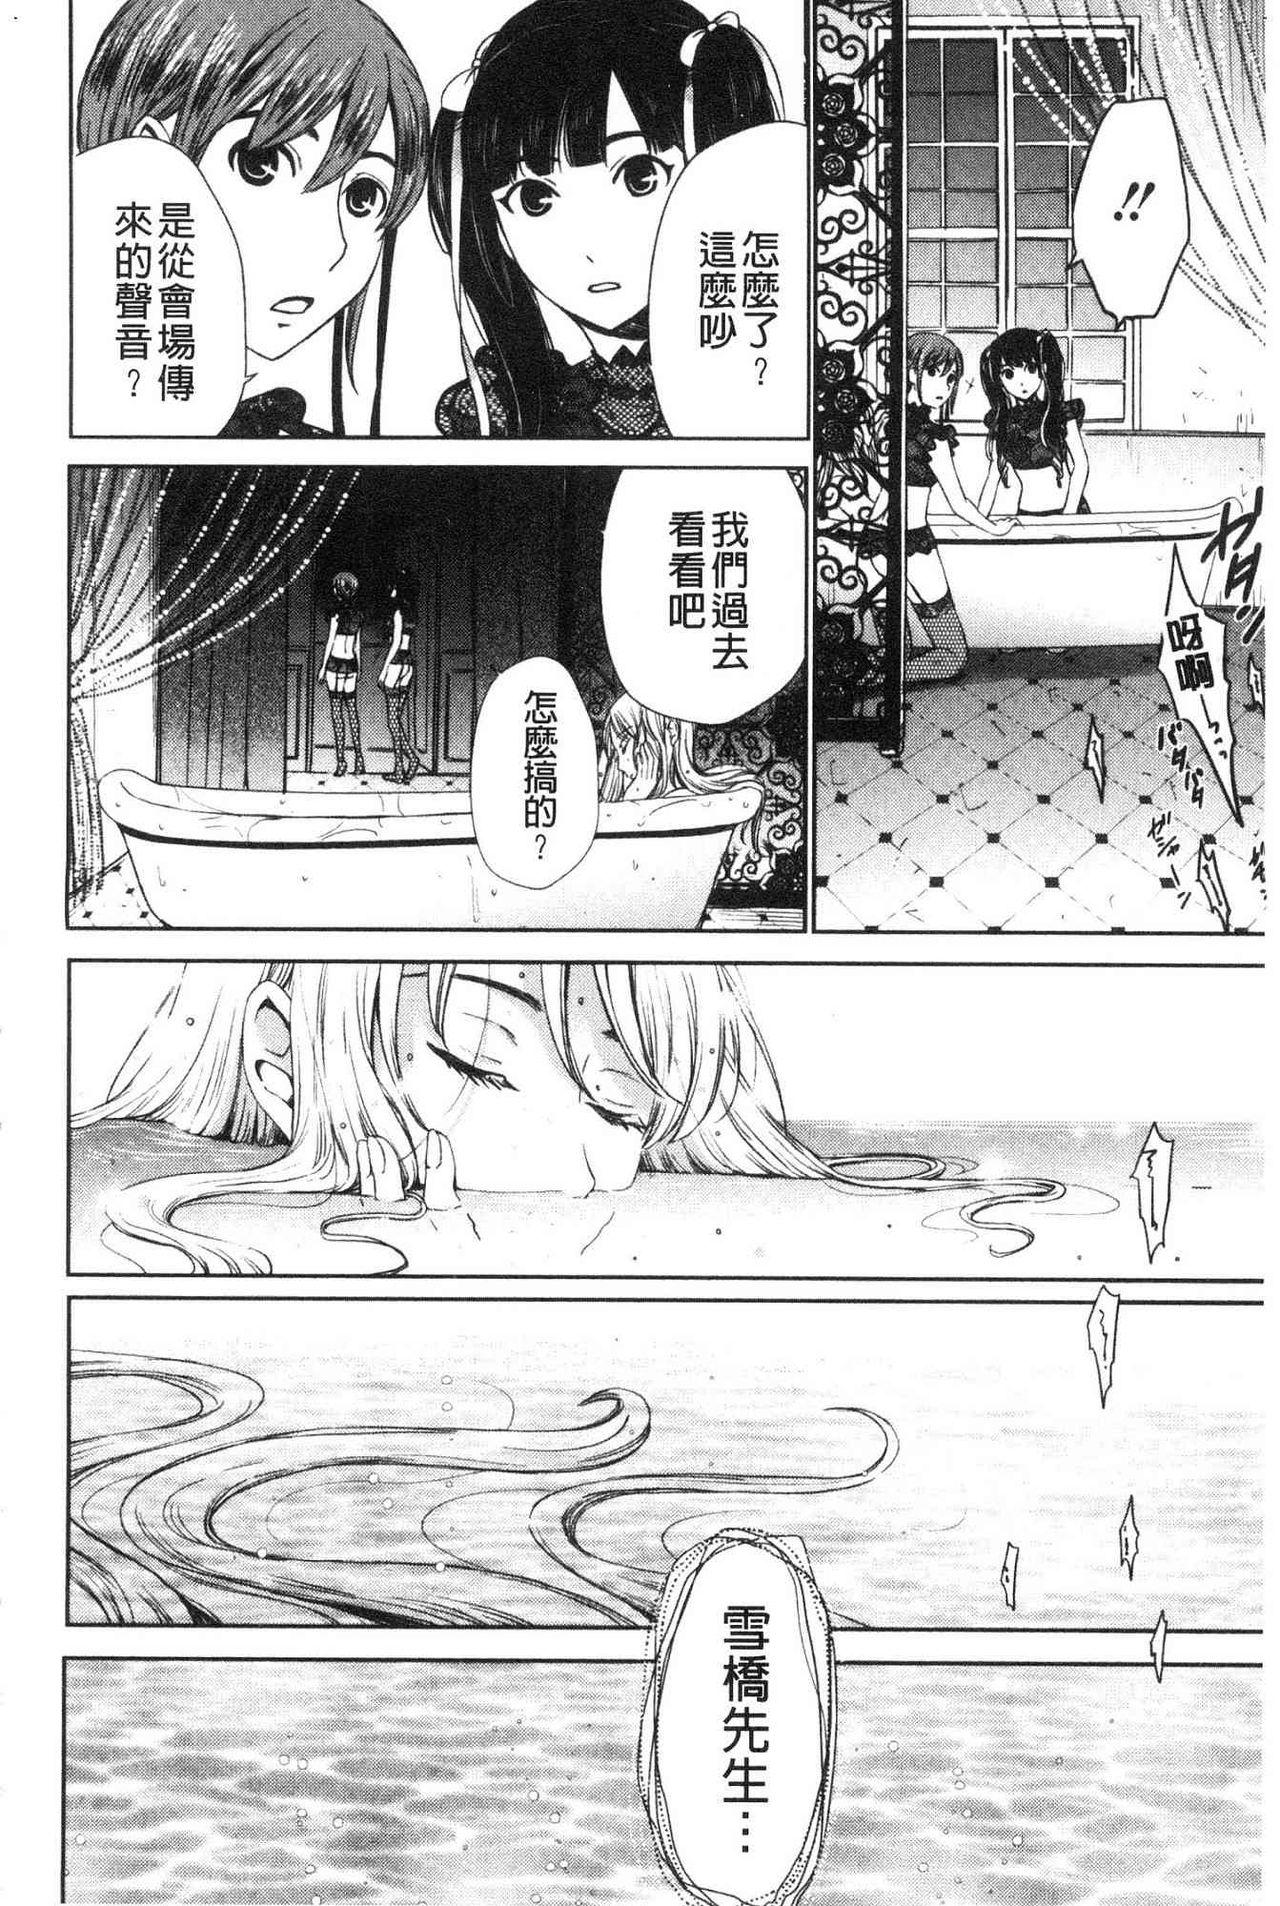 [Gotoh Akira]  21-ji no Onna ~Camera no Mae no Mesuinu~ 2 | 21時之女 ~鏡頭前的牝犬~ 2 [Chinese] 199